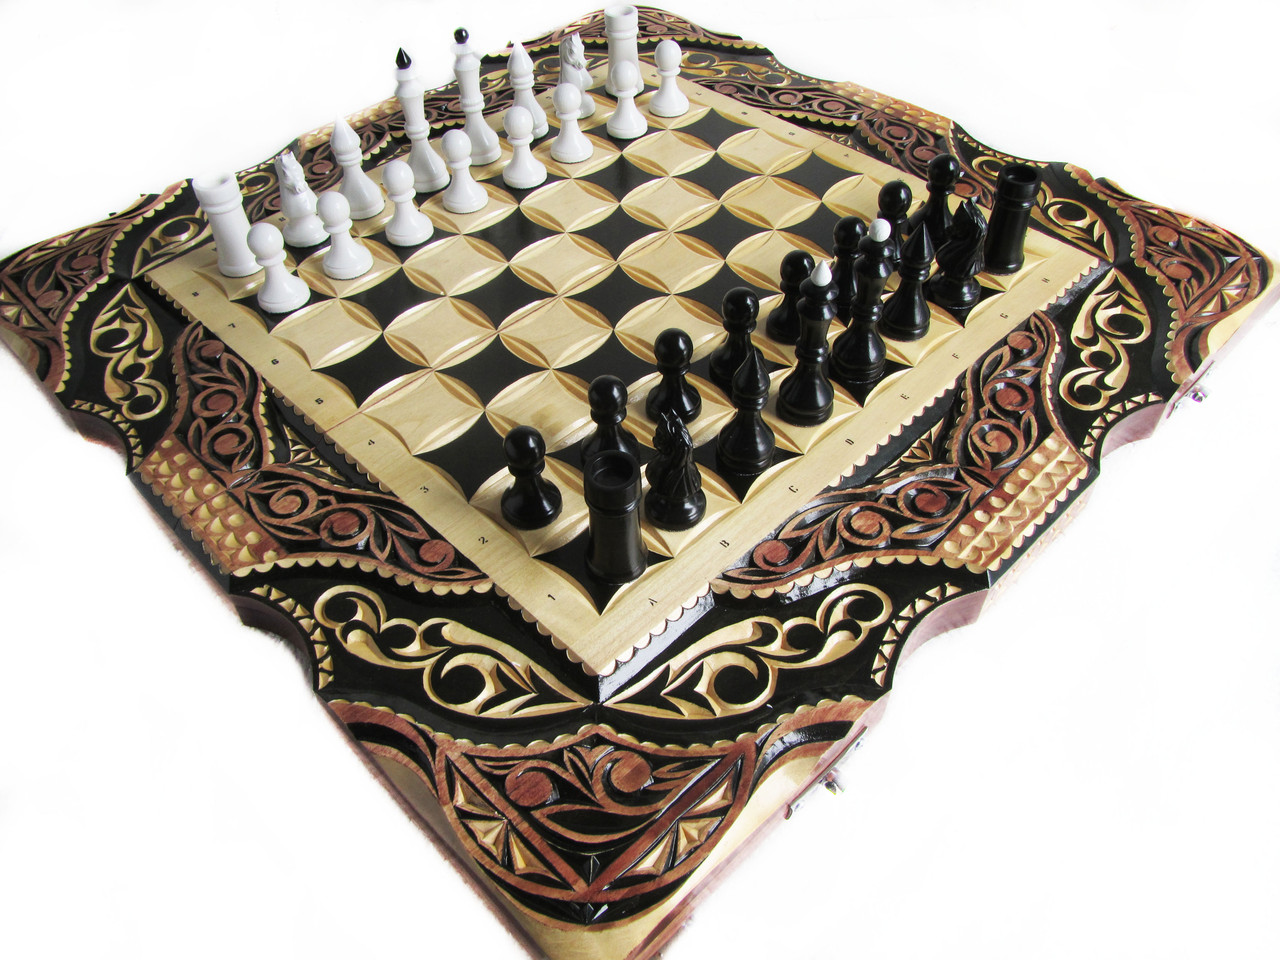 Эксклюзивные шахматы+нарды ручной работы